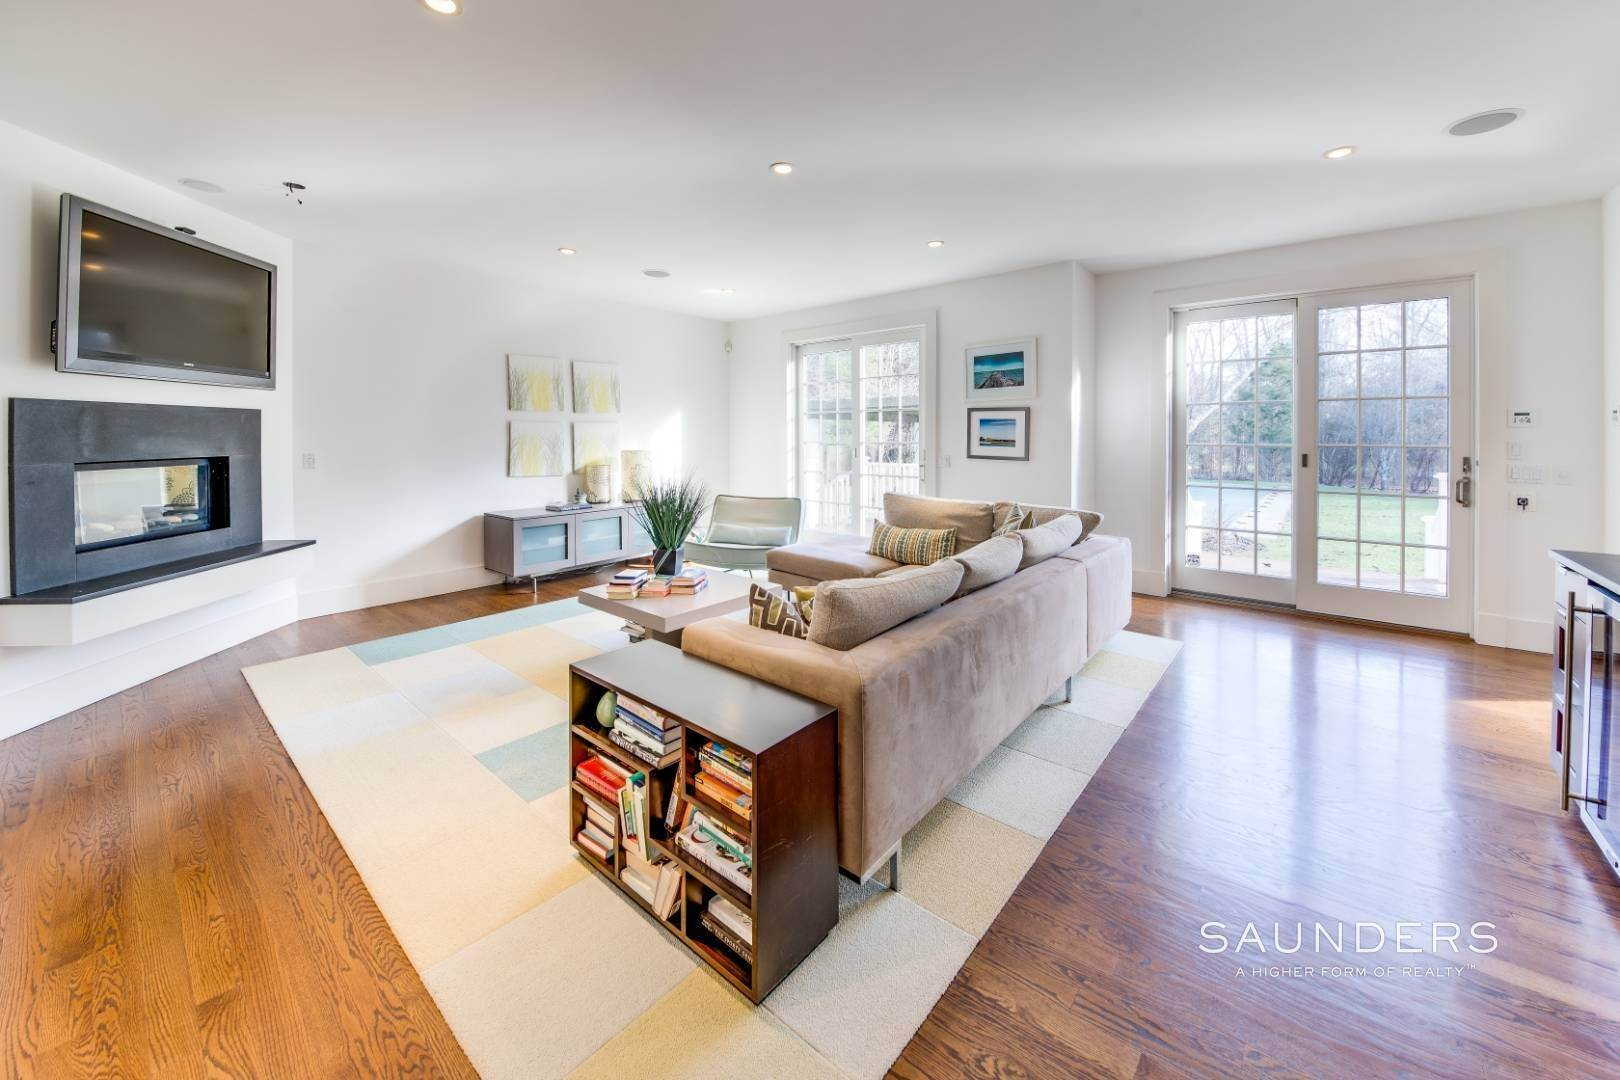 11. Single Family Homes for Sale at Wainscott South Traditional Near Beach Lane 10 Merriwood Drive, Wainscott, East Hampton Town, NY 11975